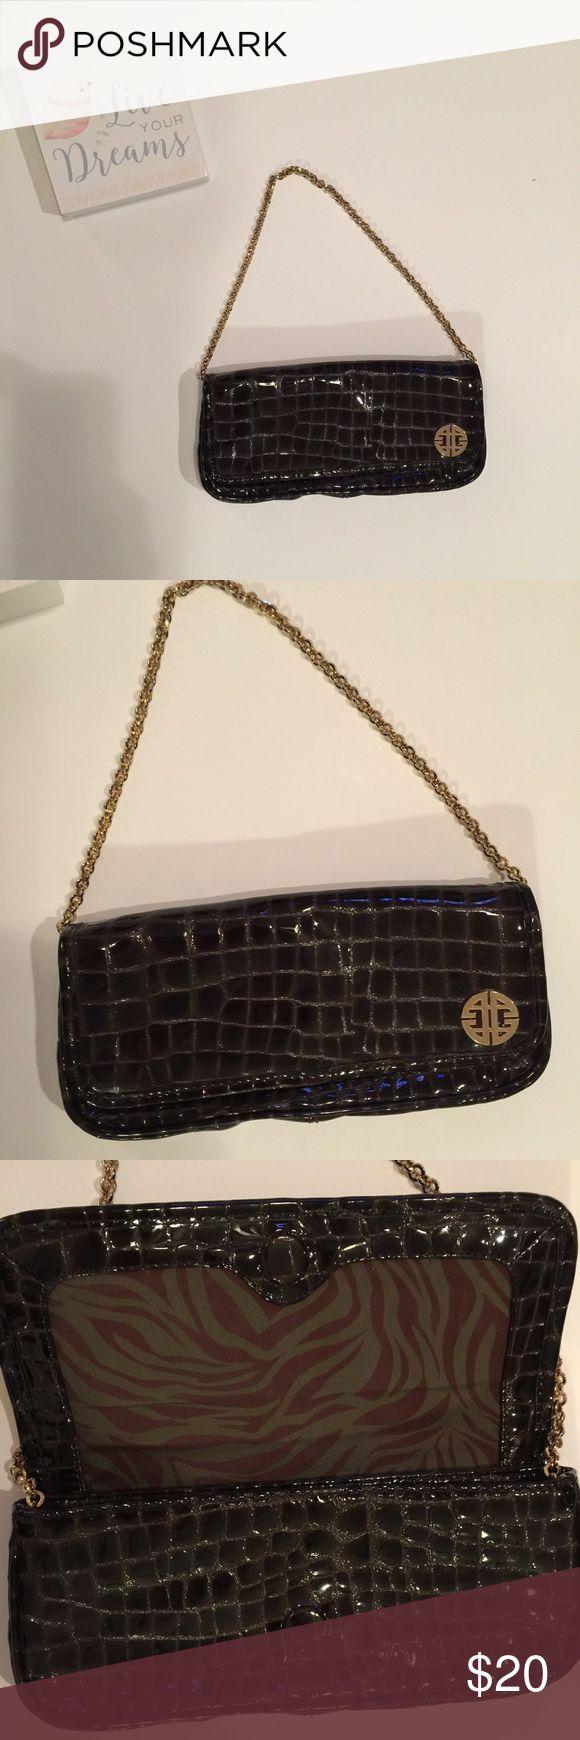 "Antonio Melani Brown Crocodile Embossed Bag Brown shiny Antonio Melani shoulder bag.  Beautiful bag, very clean and in great condition.  11"" Length, 5"" Height, 4"" Depth, 13"" Length with Shoulder Strap. ANTONIO MELANI Bags Shoulder Bags"